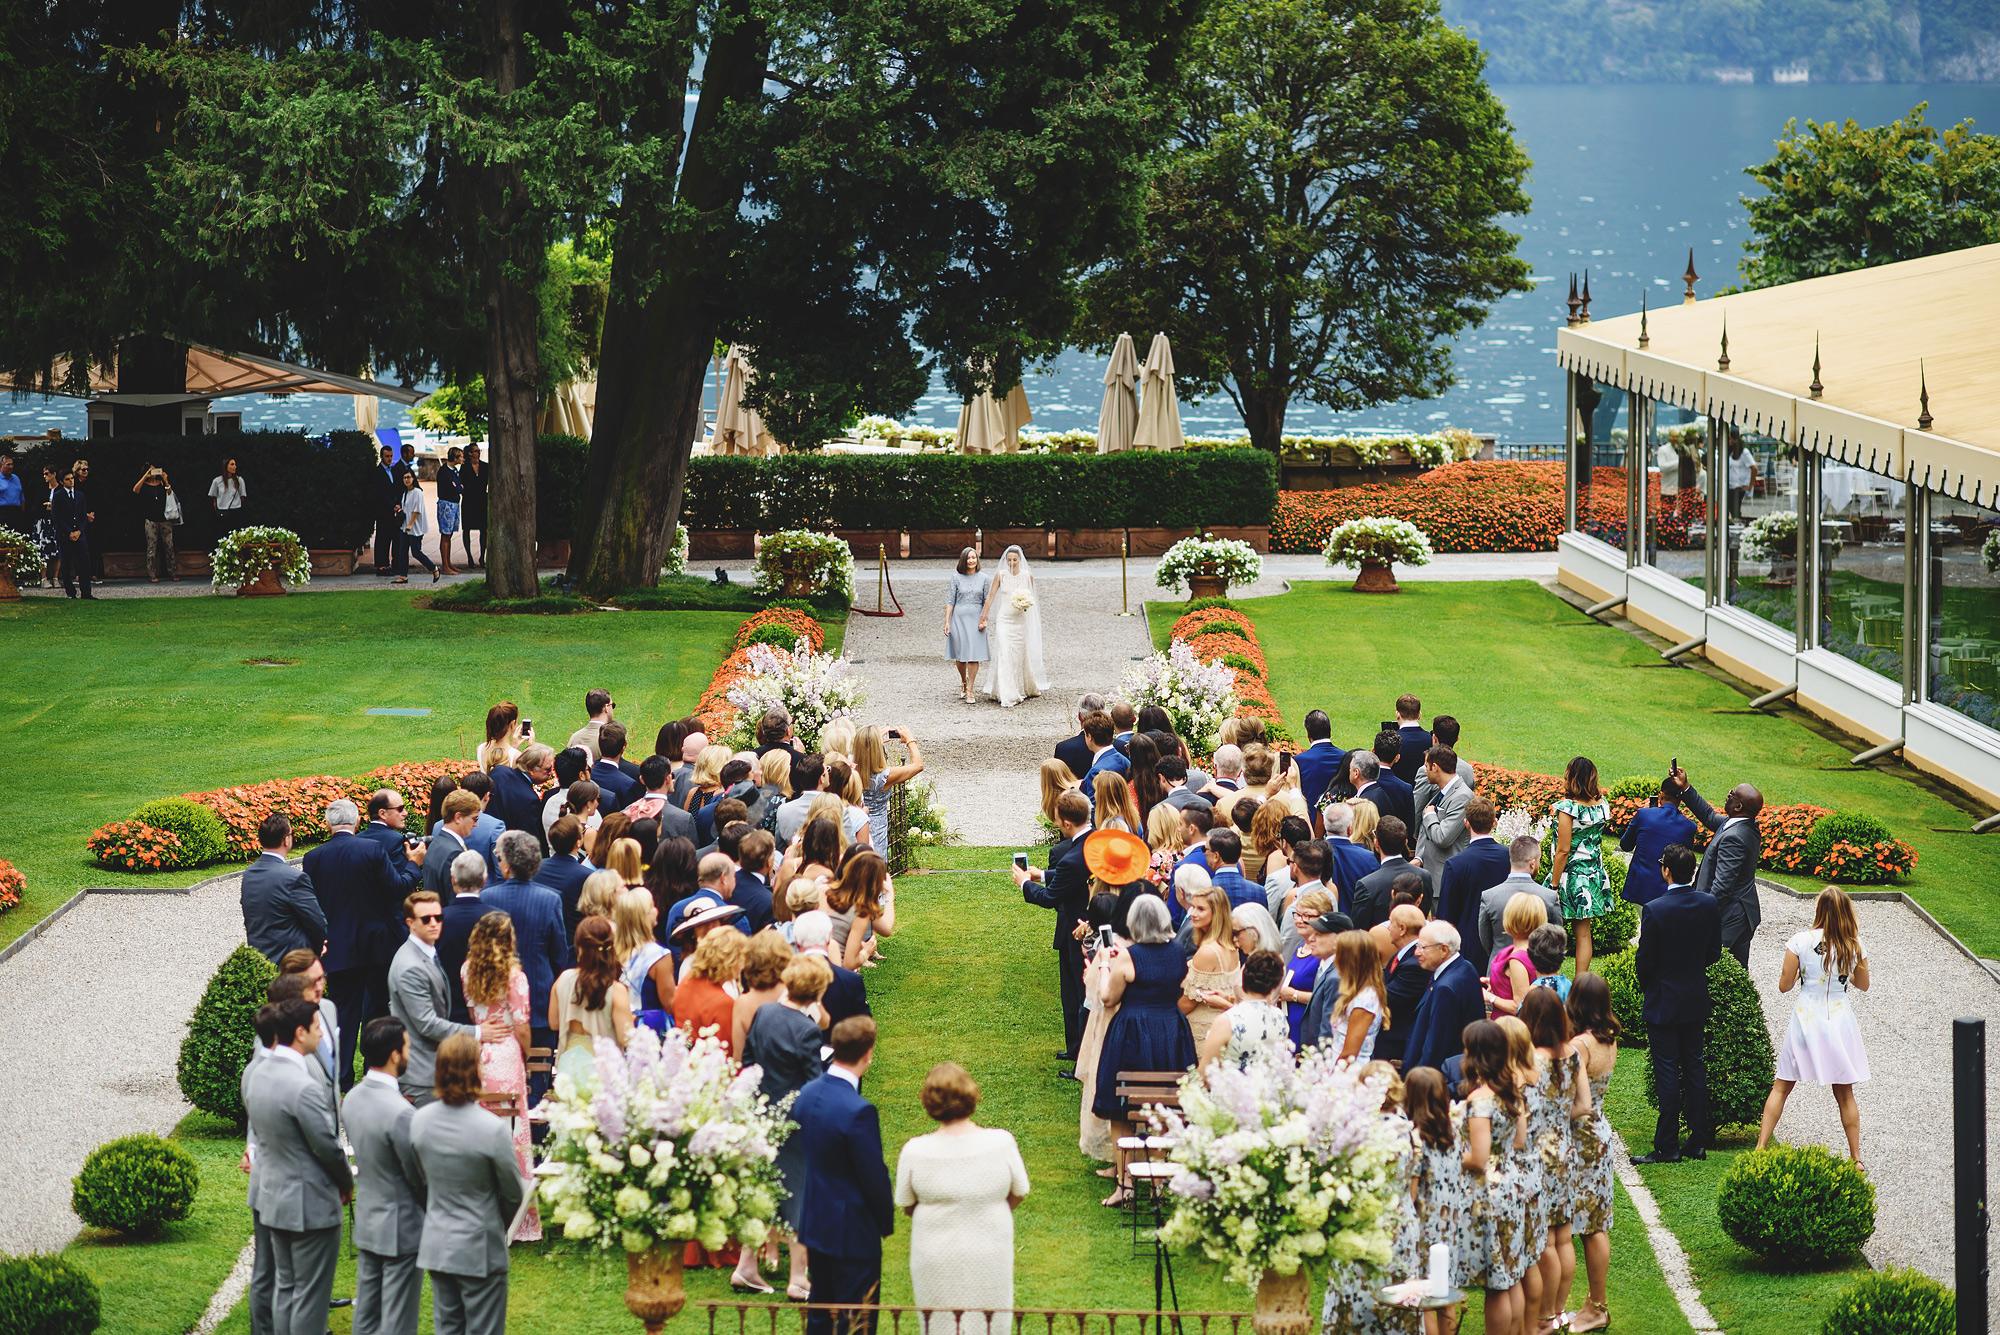 Lake Como garden ceremony photo by Ross Harvey